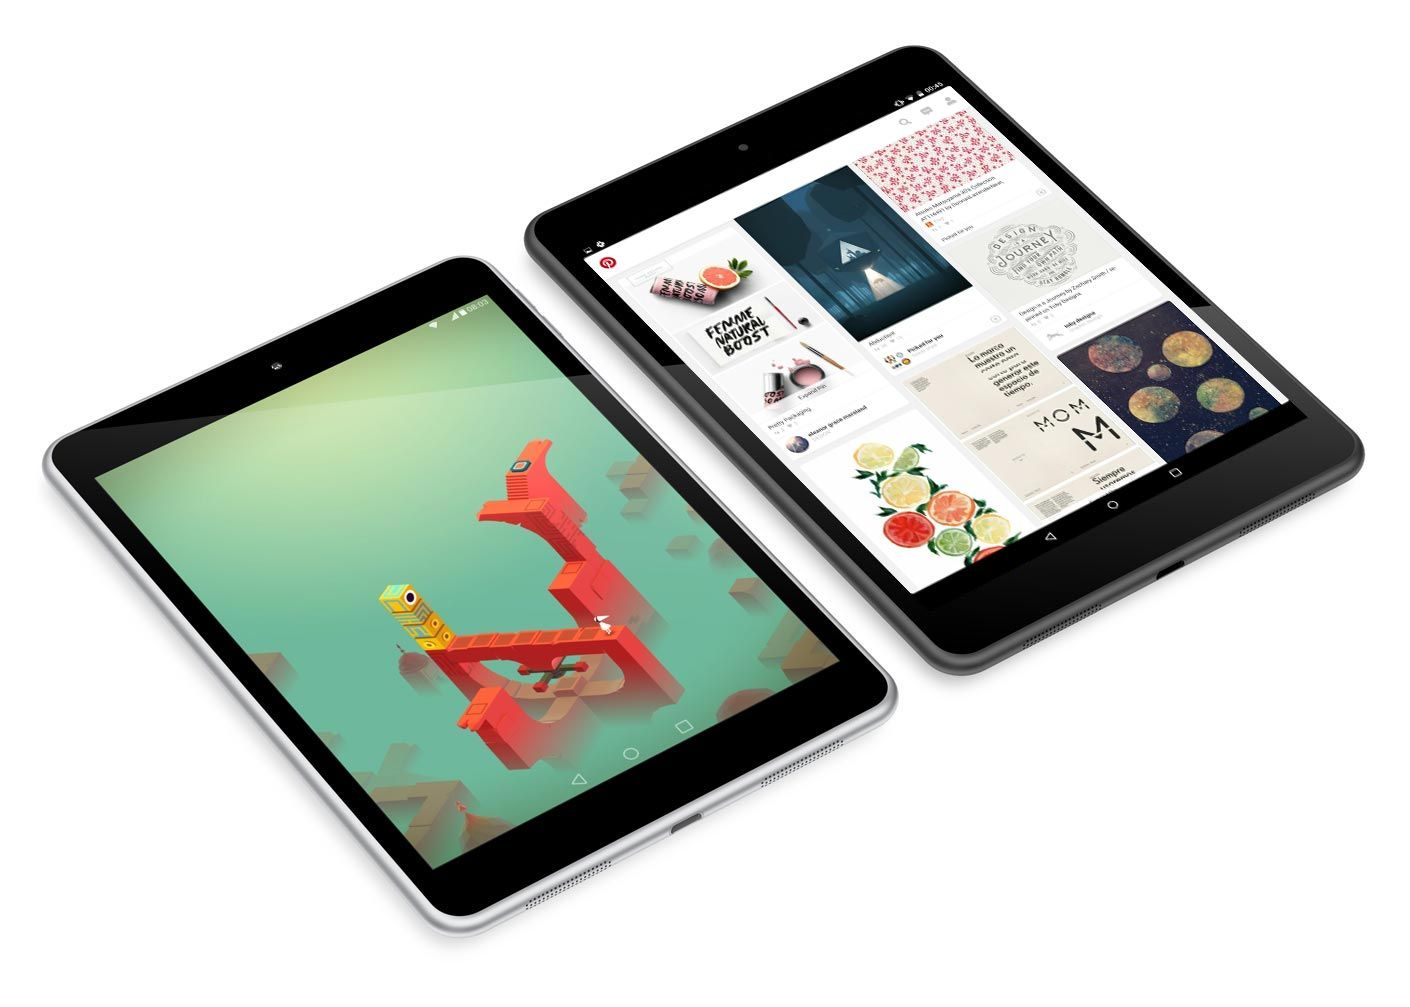 Nokia N1 Ipad mini, Ipad mini 3